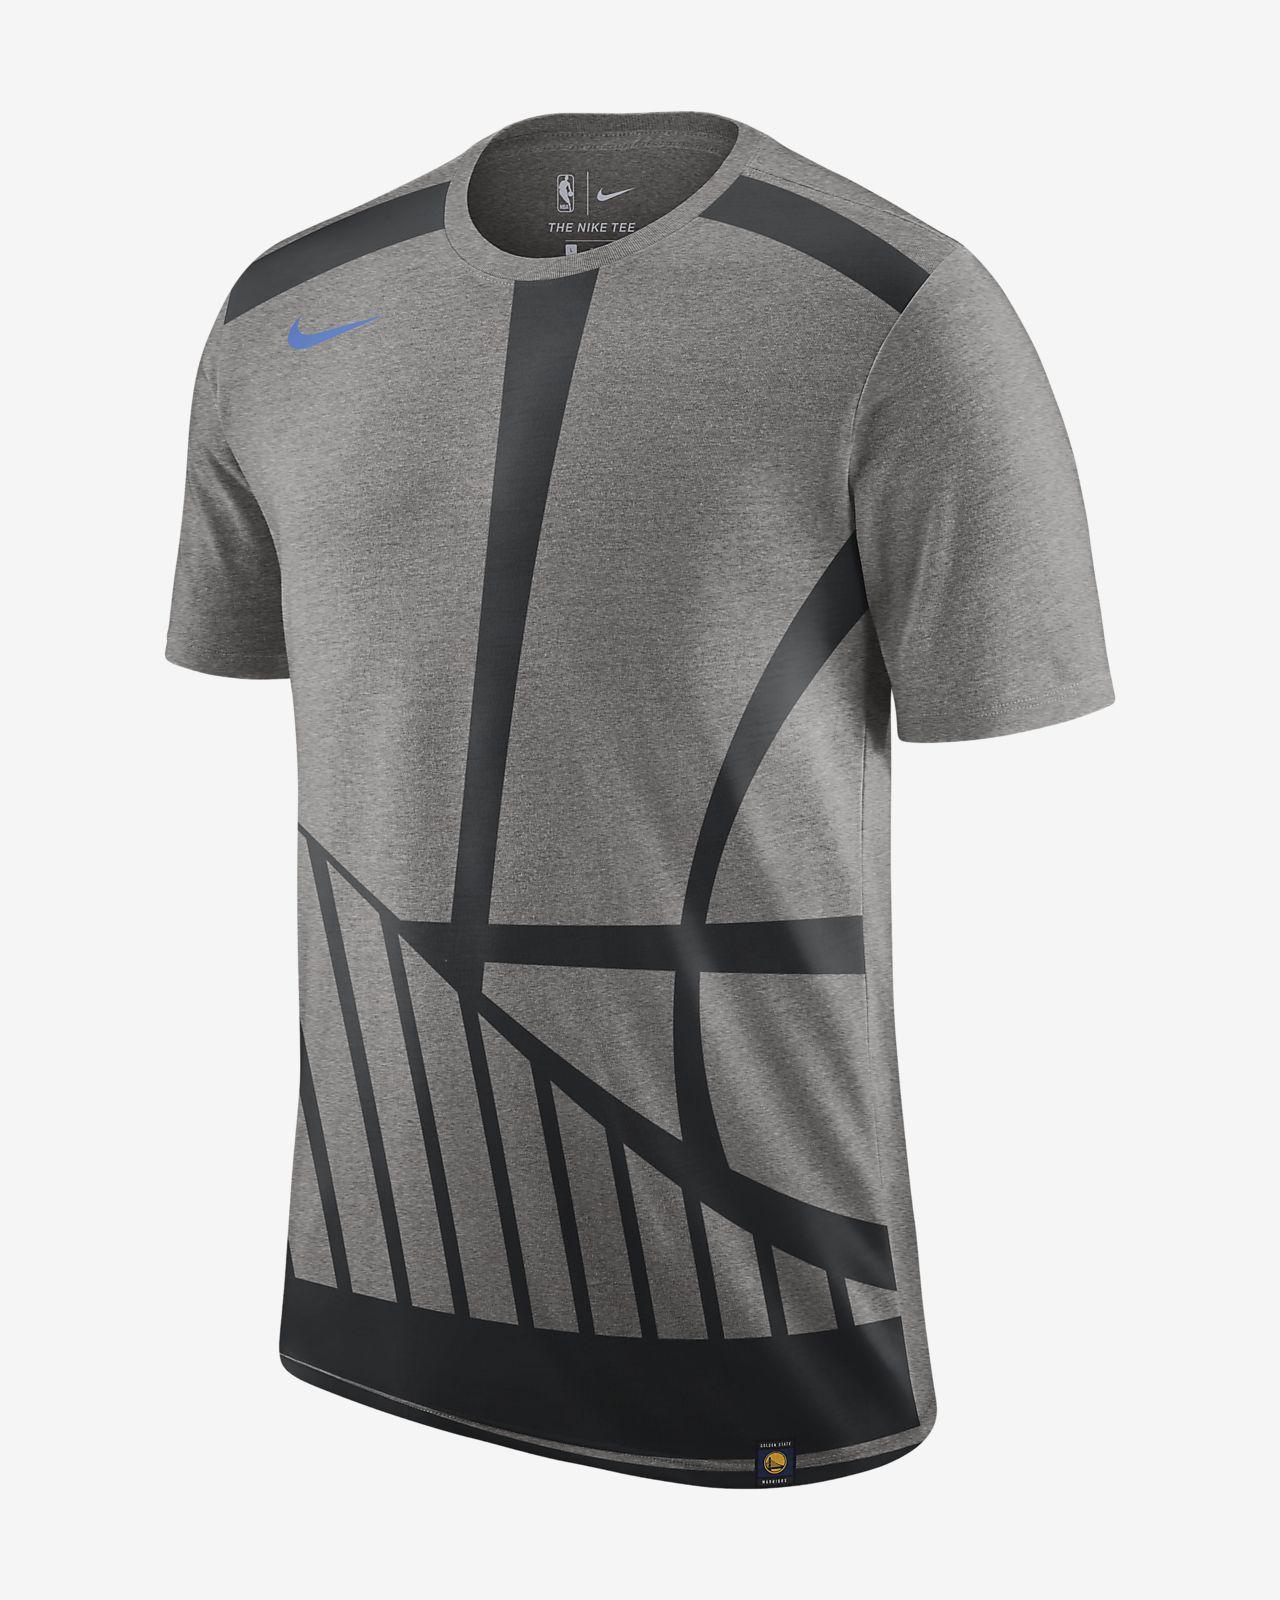 Golden State Warriors Nike Men's Basketball T-Shirt